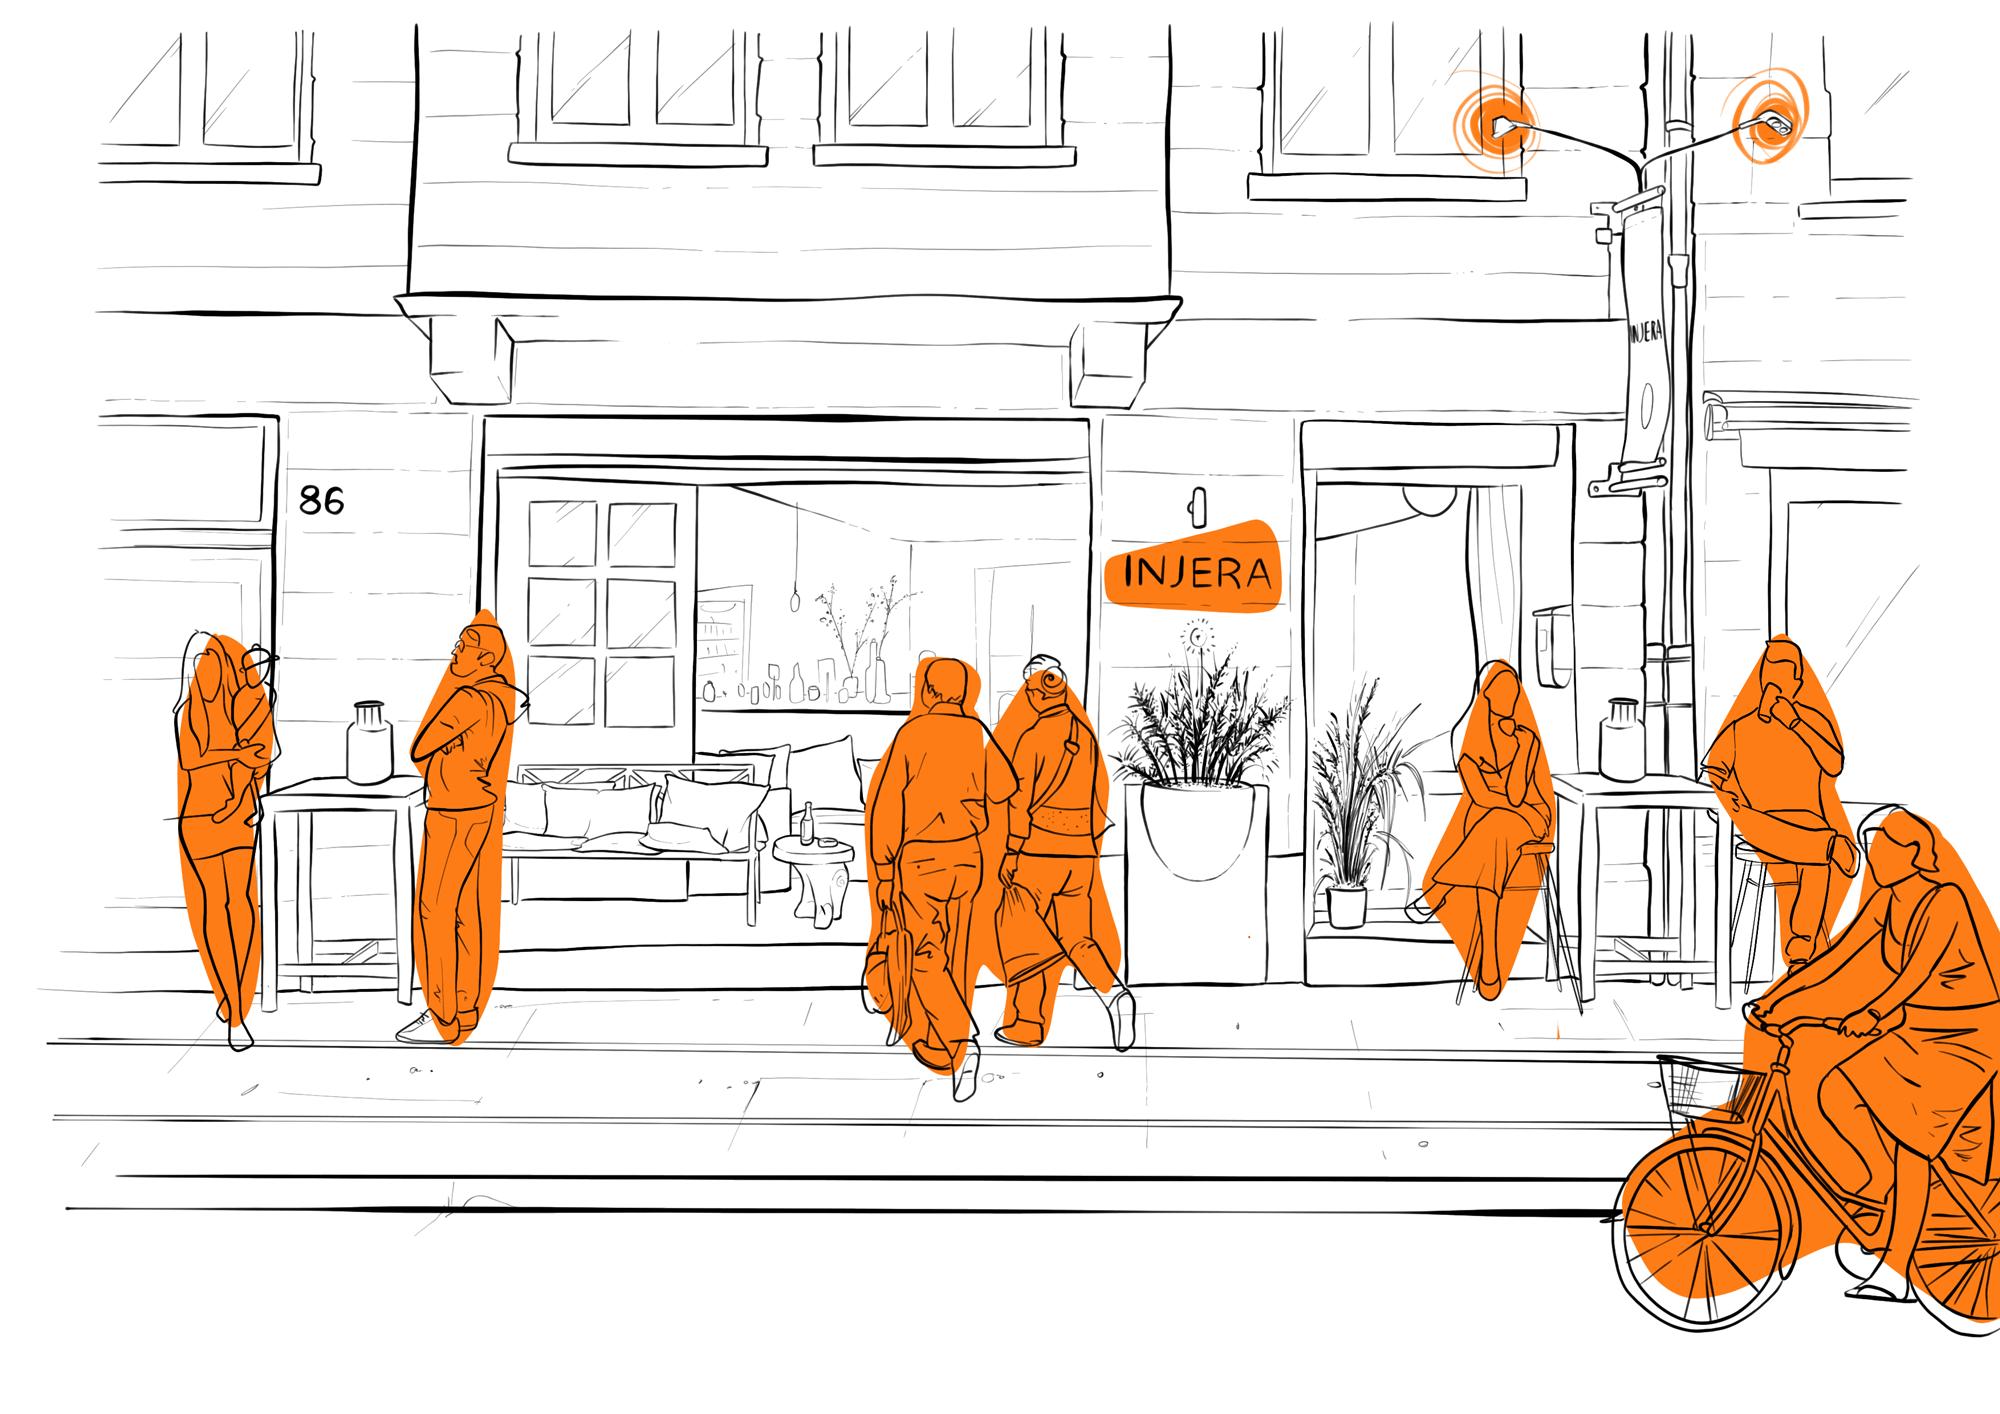 Restaurant Injera